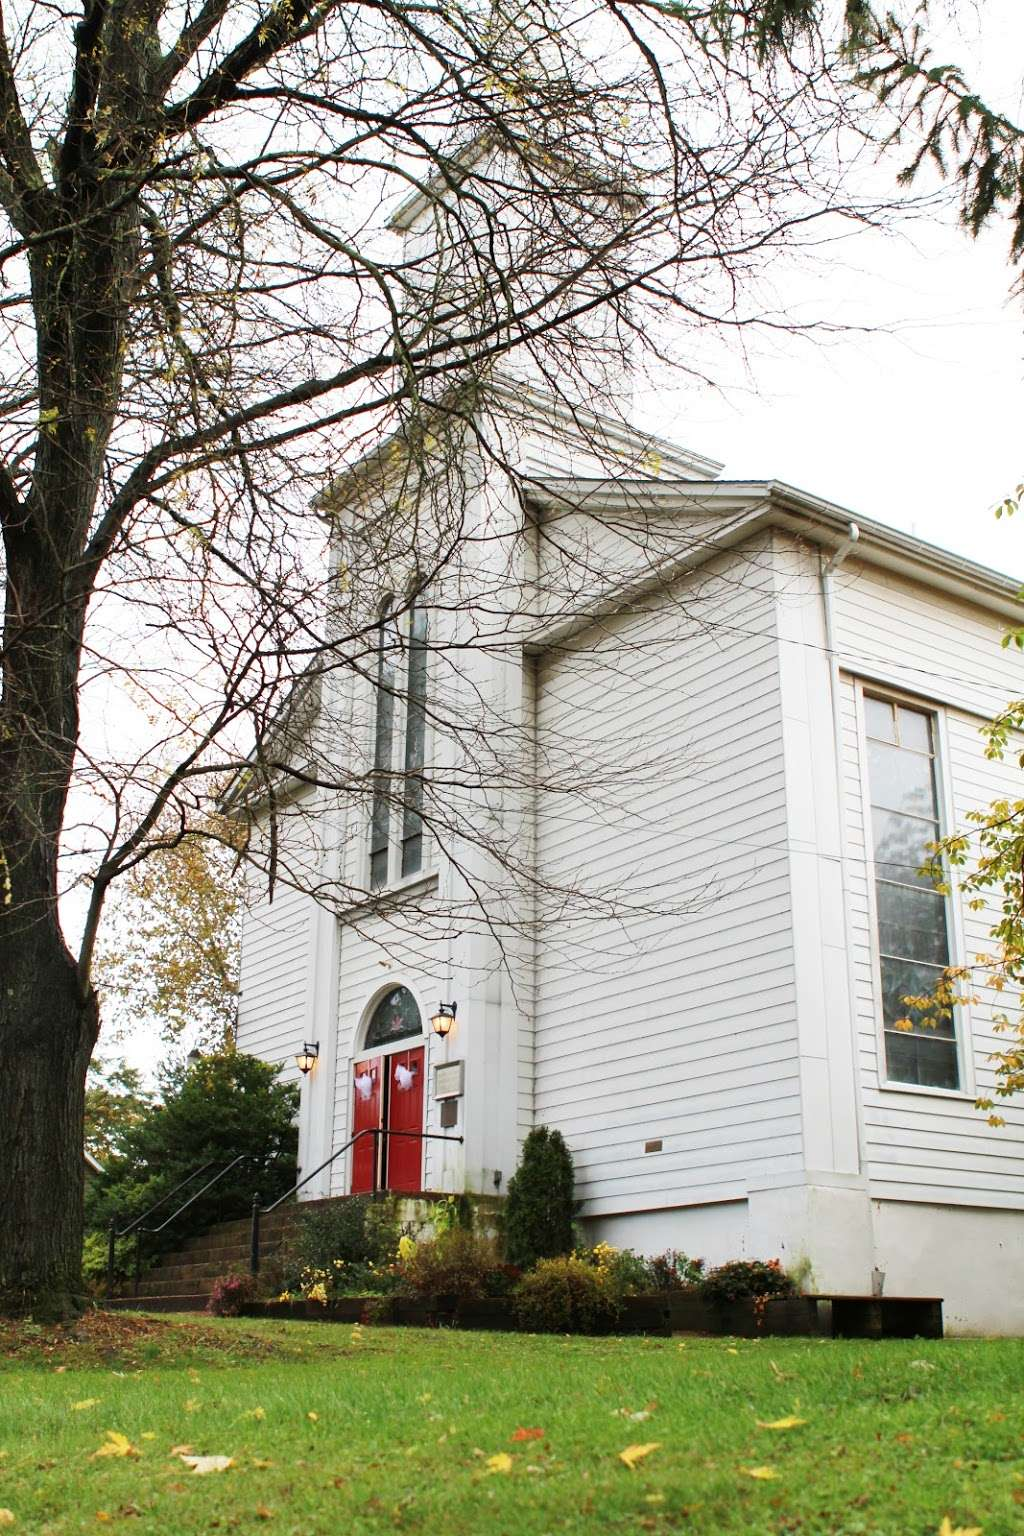 First Presbyterian Church of Bloomsbury, N.J. - church  | Photo 1 of 7 | Address: 66 Church St, Bloomsbury, NJ 08804, USA | Phone: (908) 479-4700